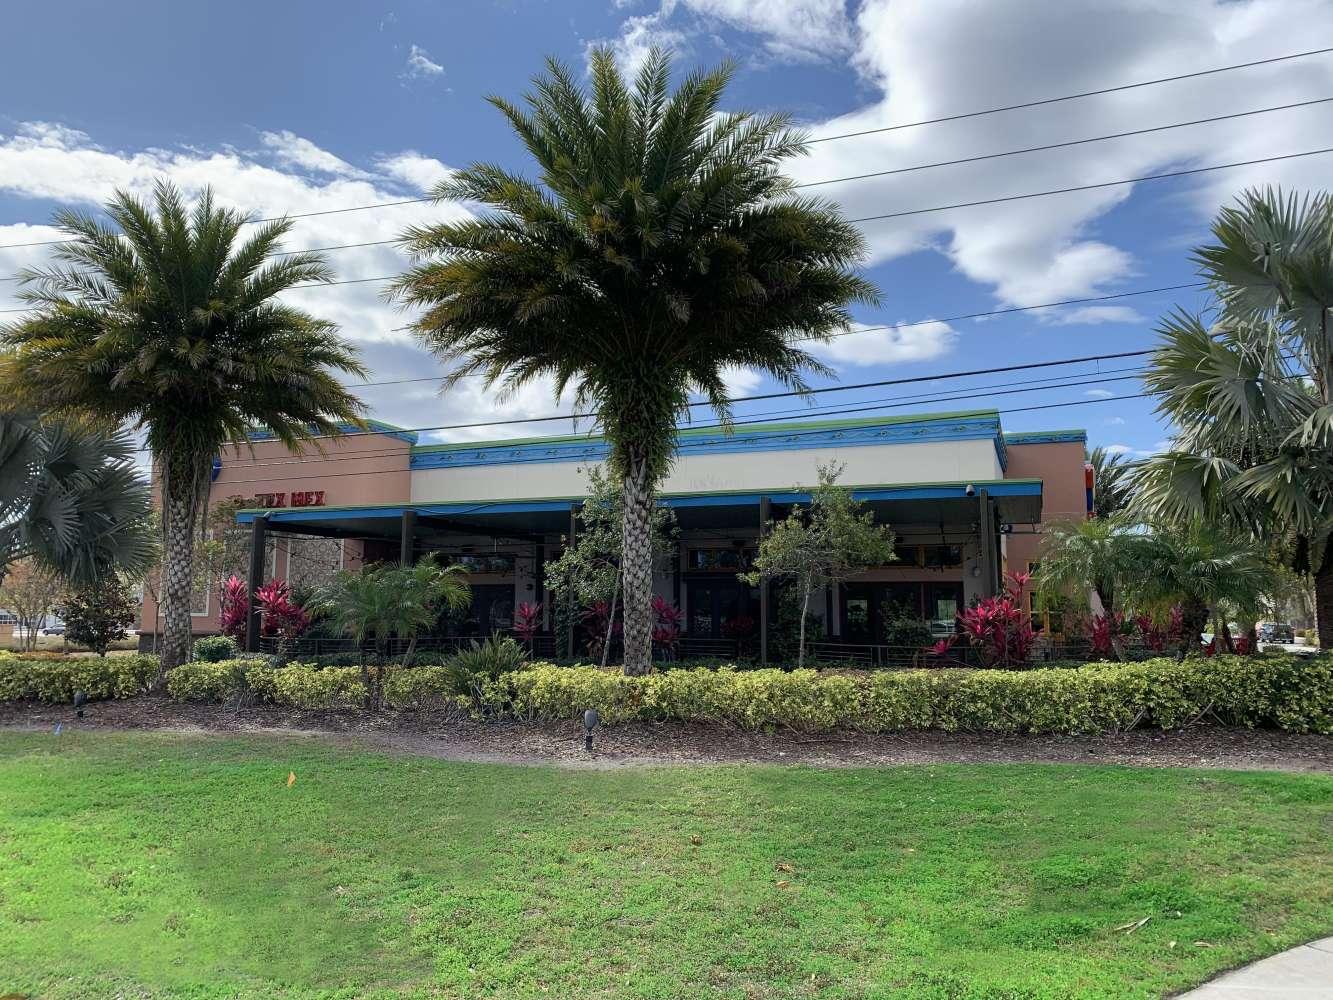 Retail Orlando, 32828 - 1434 N Alafaya Trail - Retail